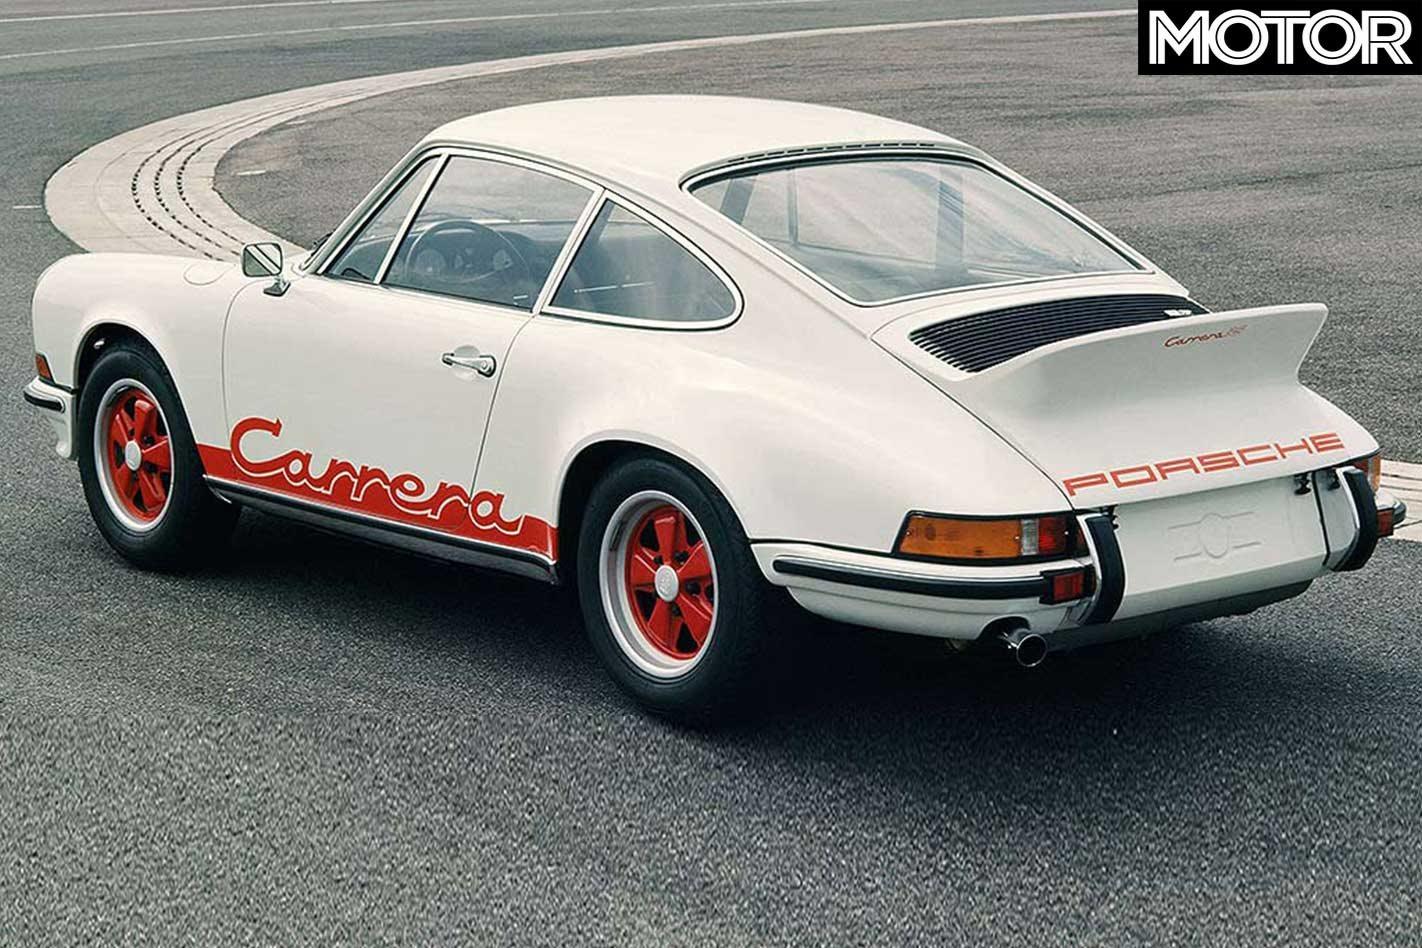 1973 Porsche 911 Carrera Rs 2 7 The Five Greatest 911s